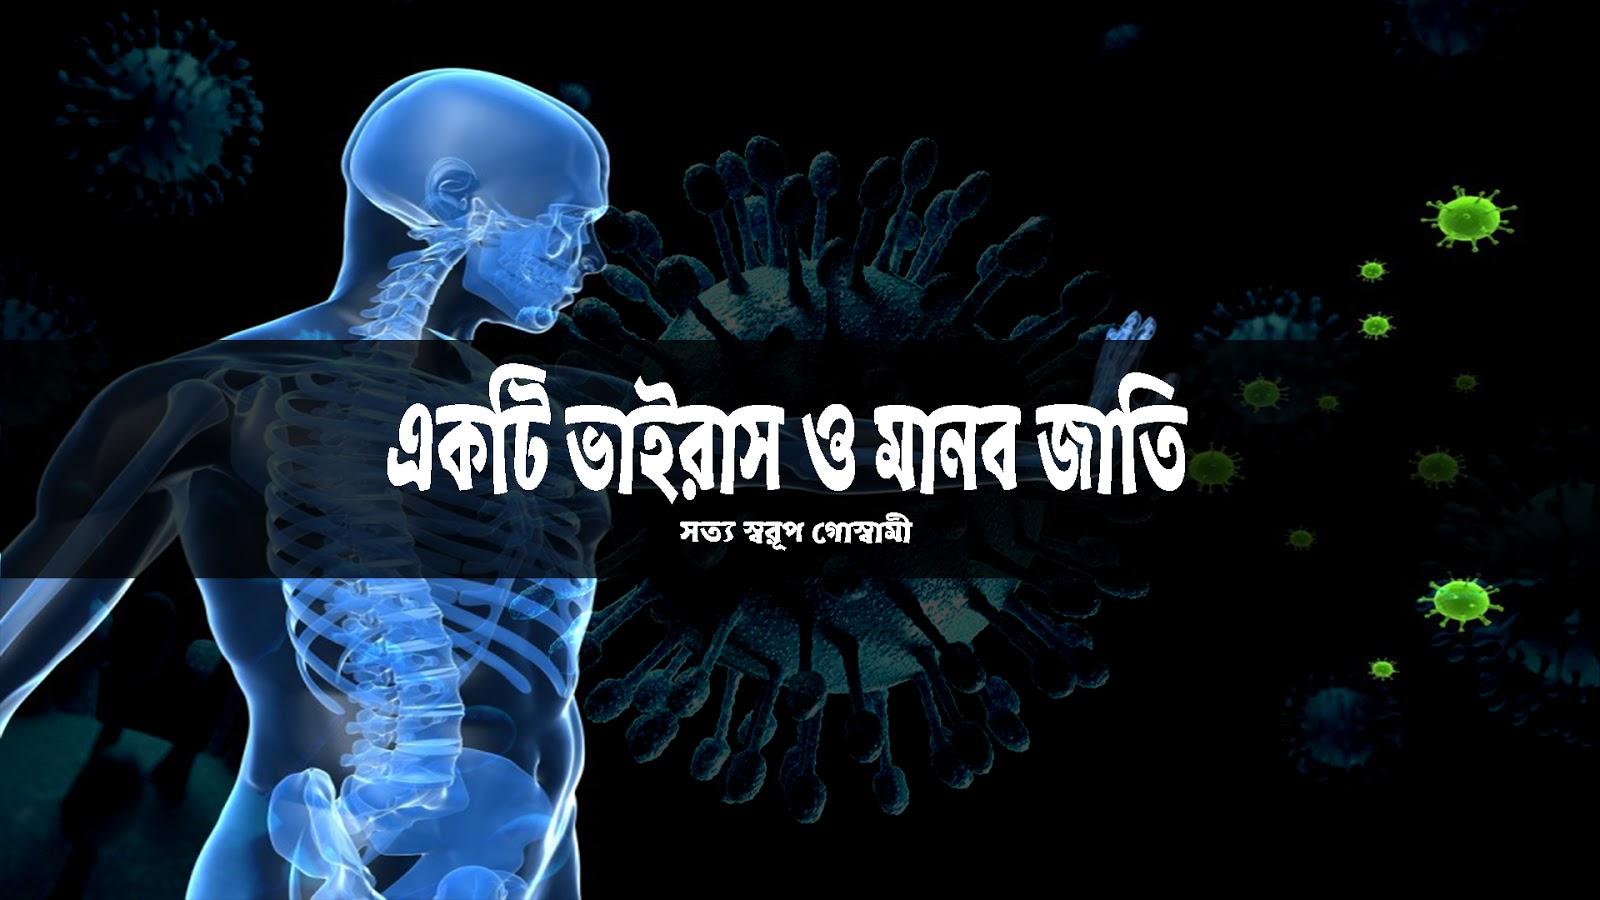 Bangla Kobita : একটি ভাইরাস ও মানব জাতি রচনা সত্য স্বরূপ গোস্বামী | Bengali Poem : Ekti Virus O Manab Jati by Satya Sarup Goswami | DjM Originals